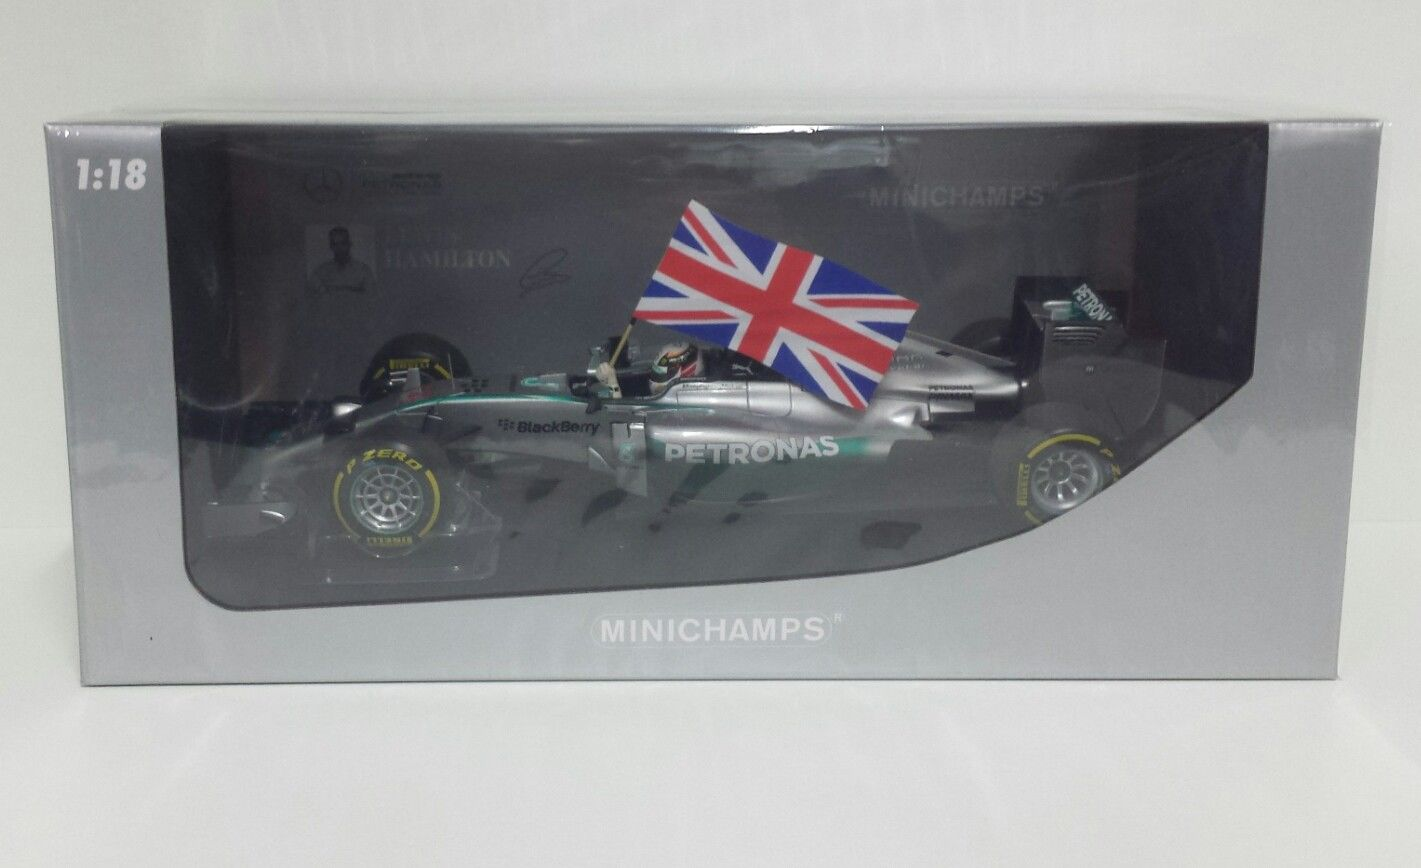 MINICHAMPS LEWIS HAMILTON 1/18 MERCEDES AMG PETRONAS F1 WINNER GP ABU DHABI 2014